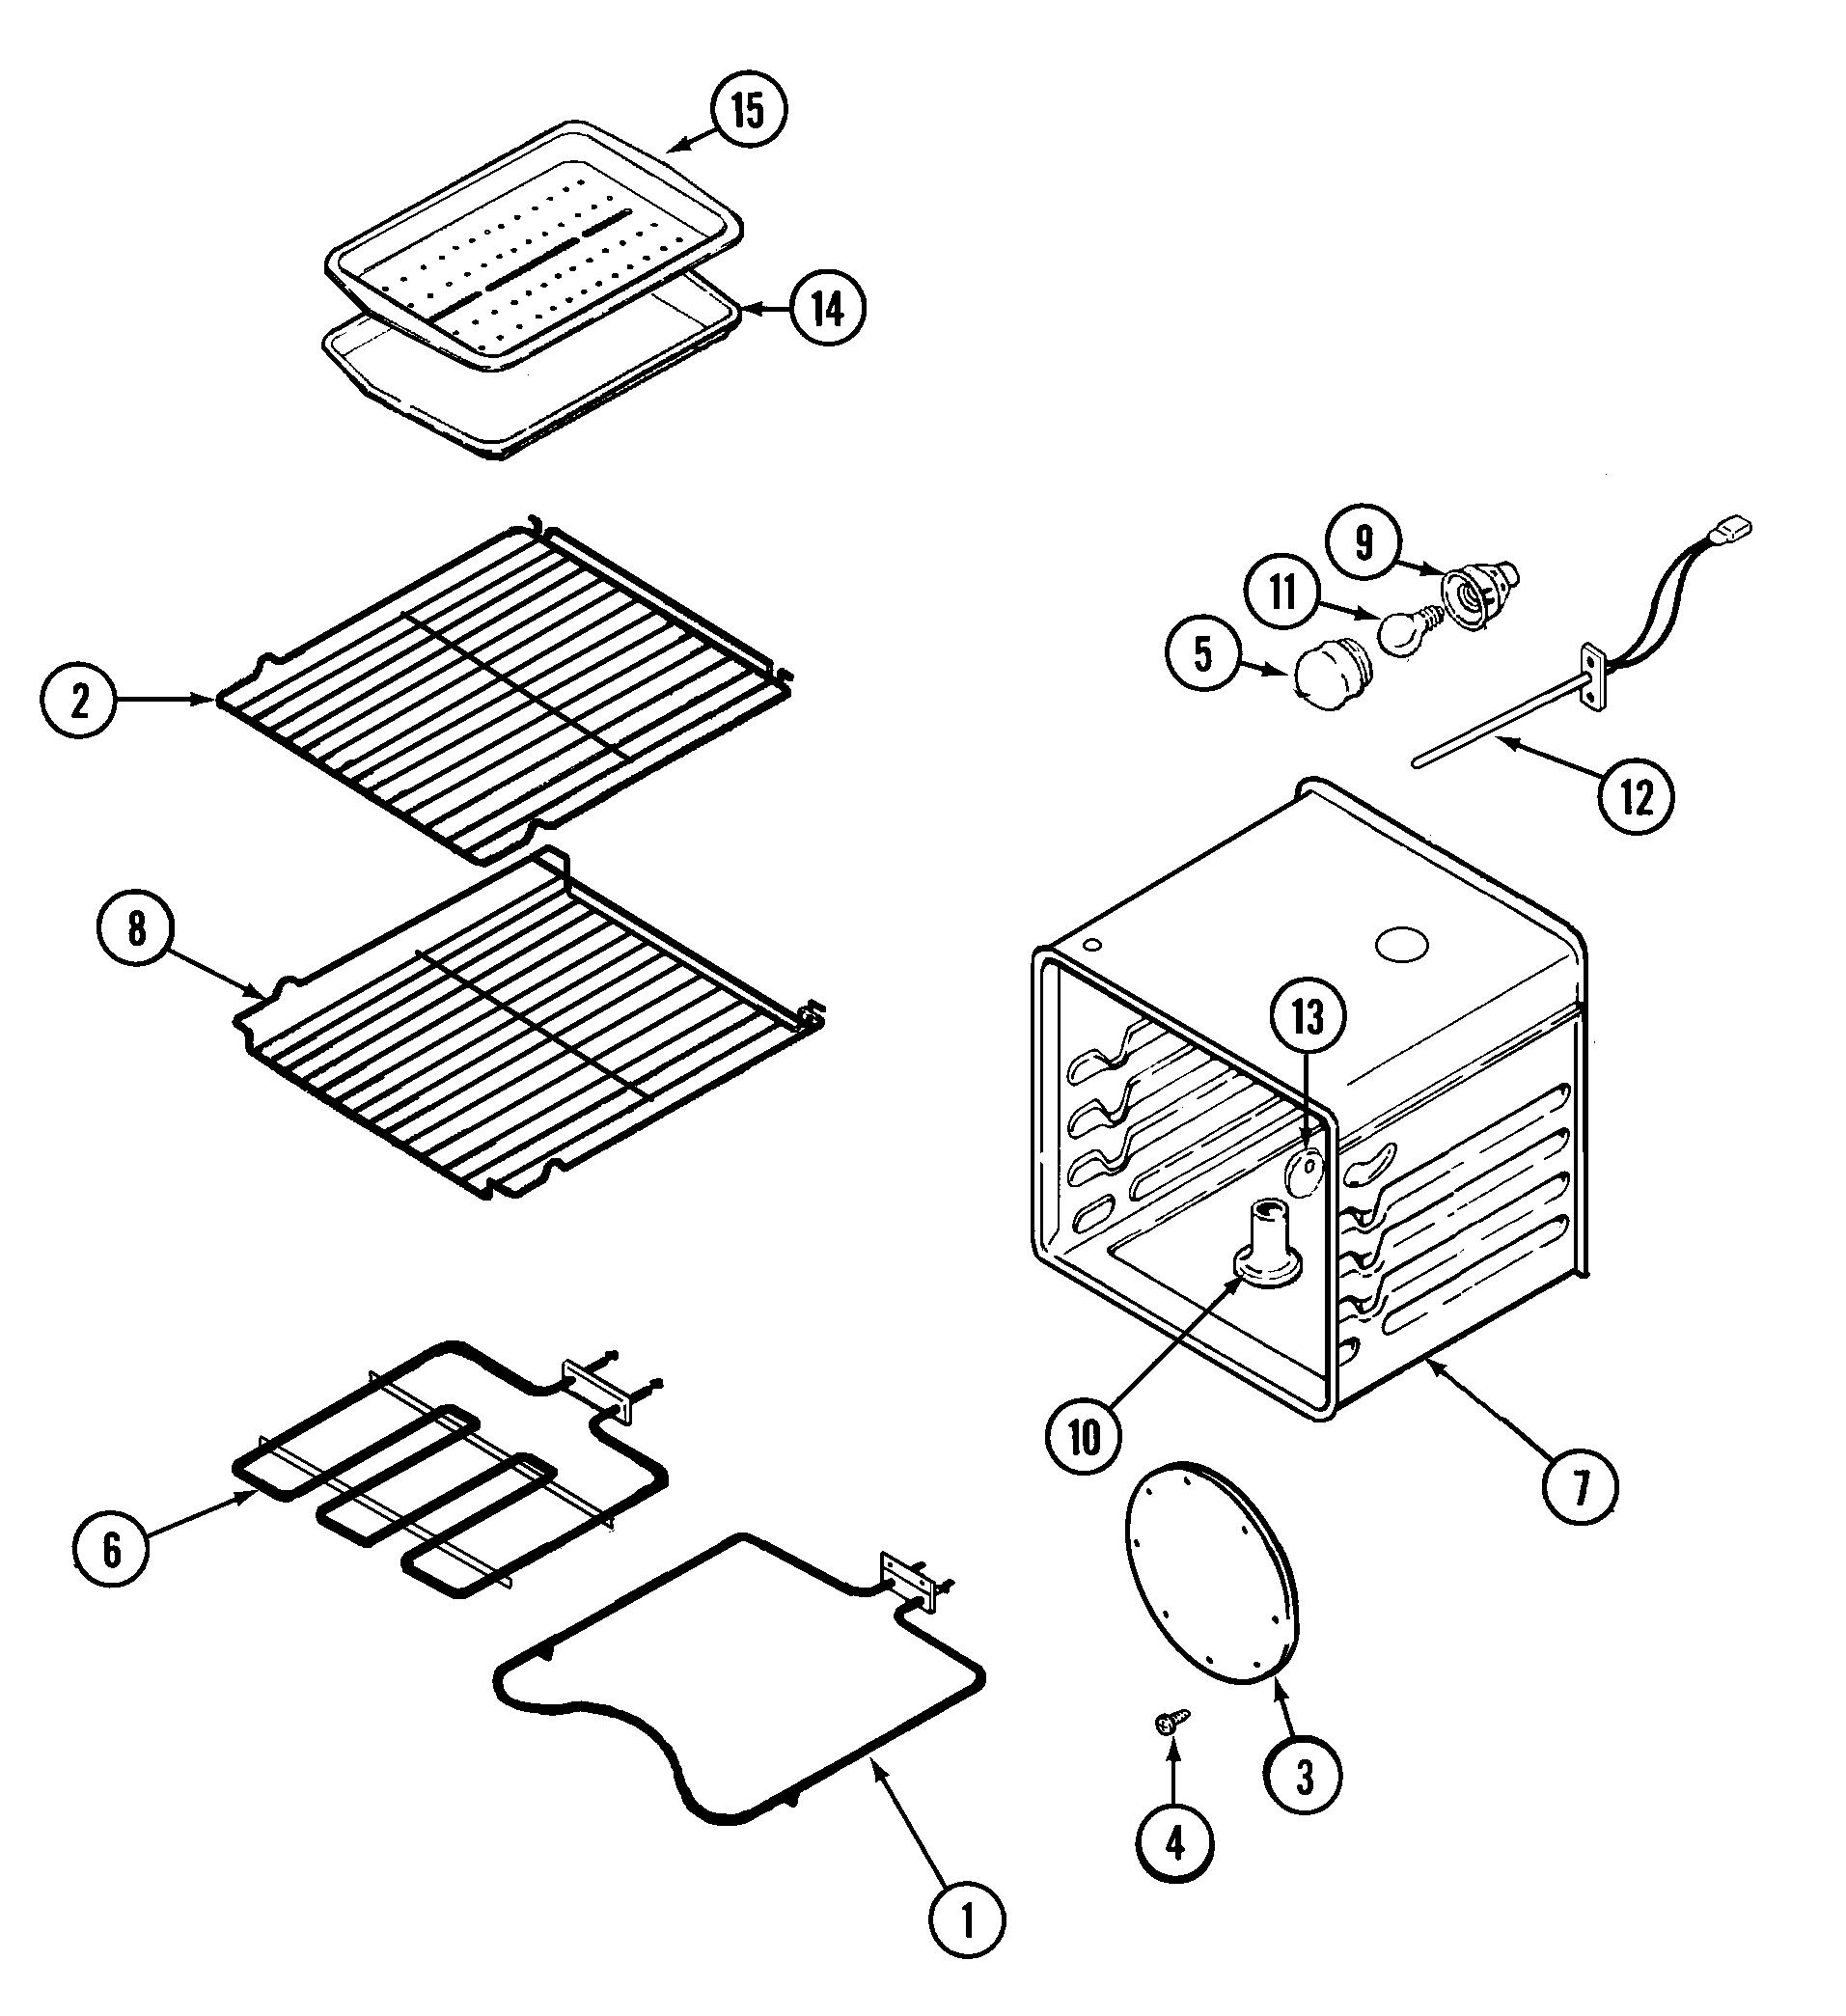 jenn-air w27100w electric wall oven timer